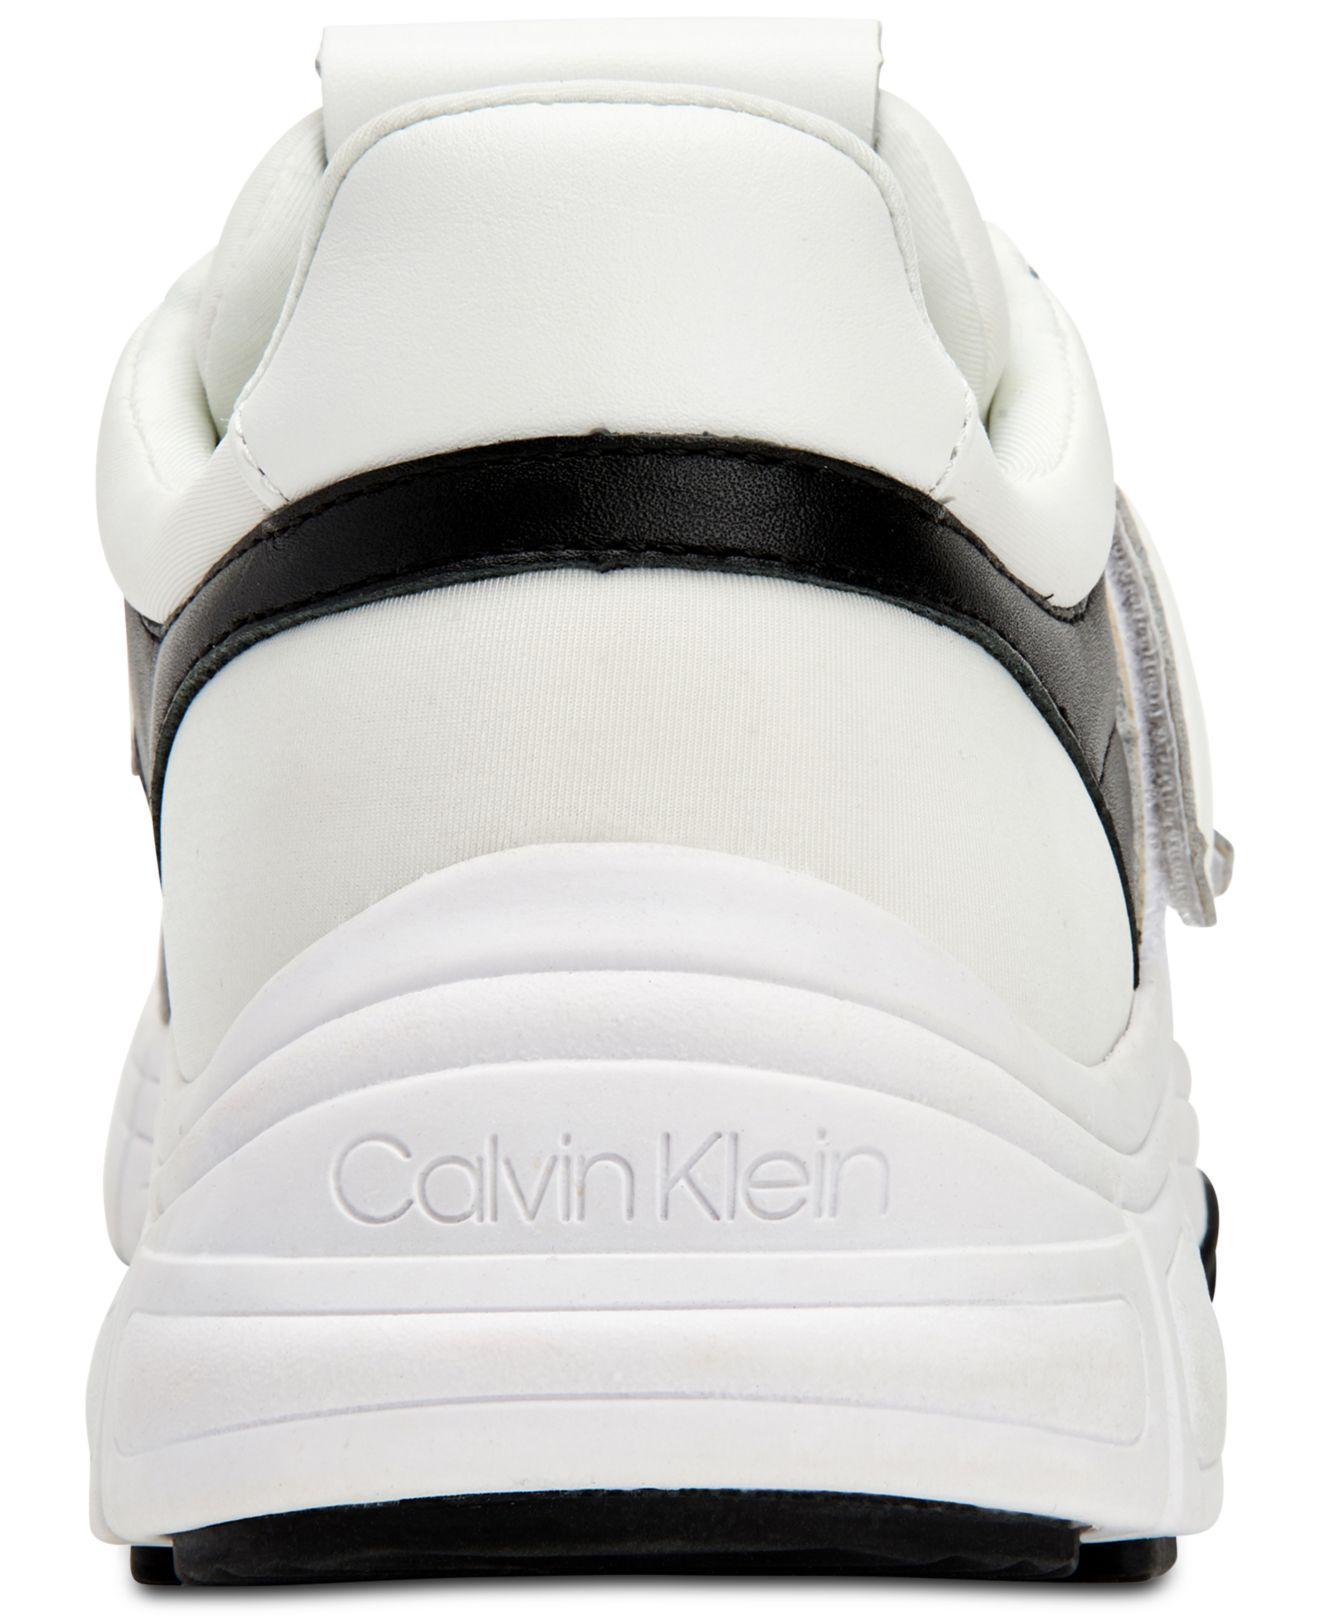 Calvin Klein Leather Dallen Sneakers in